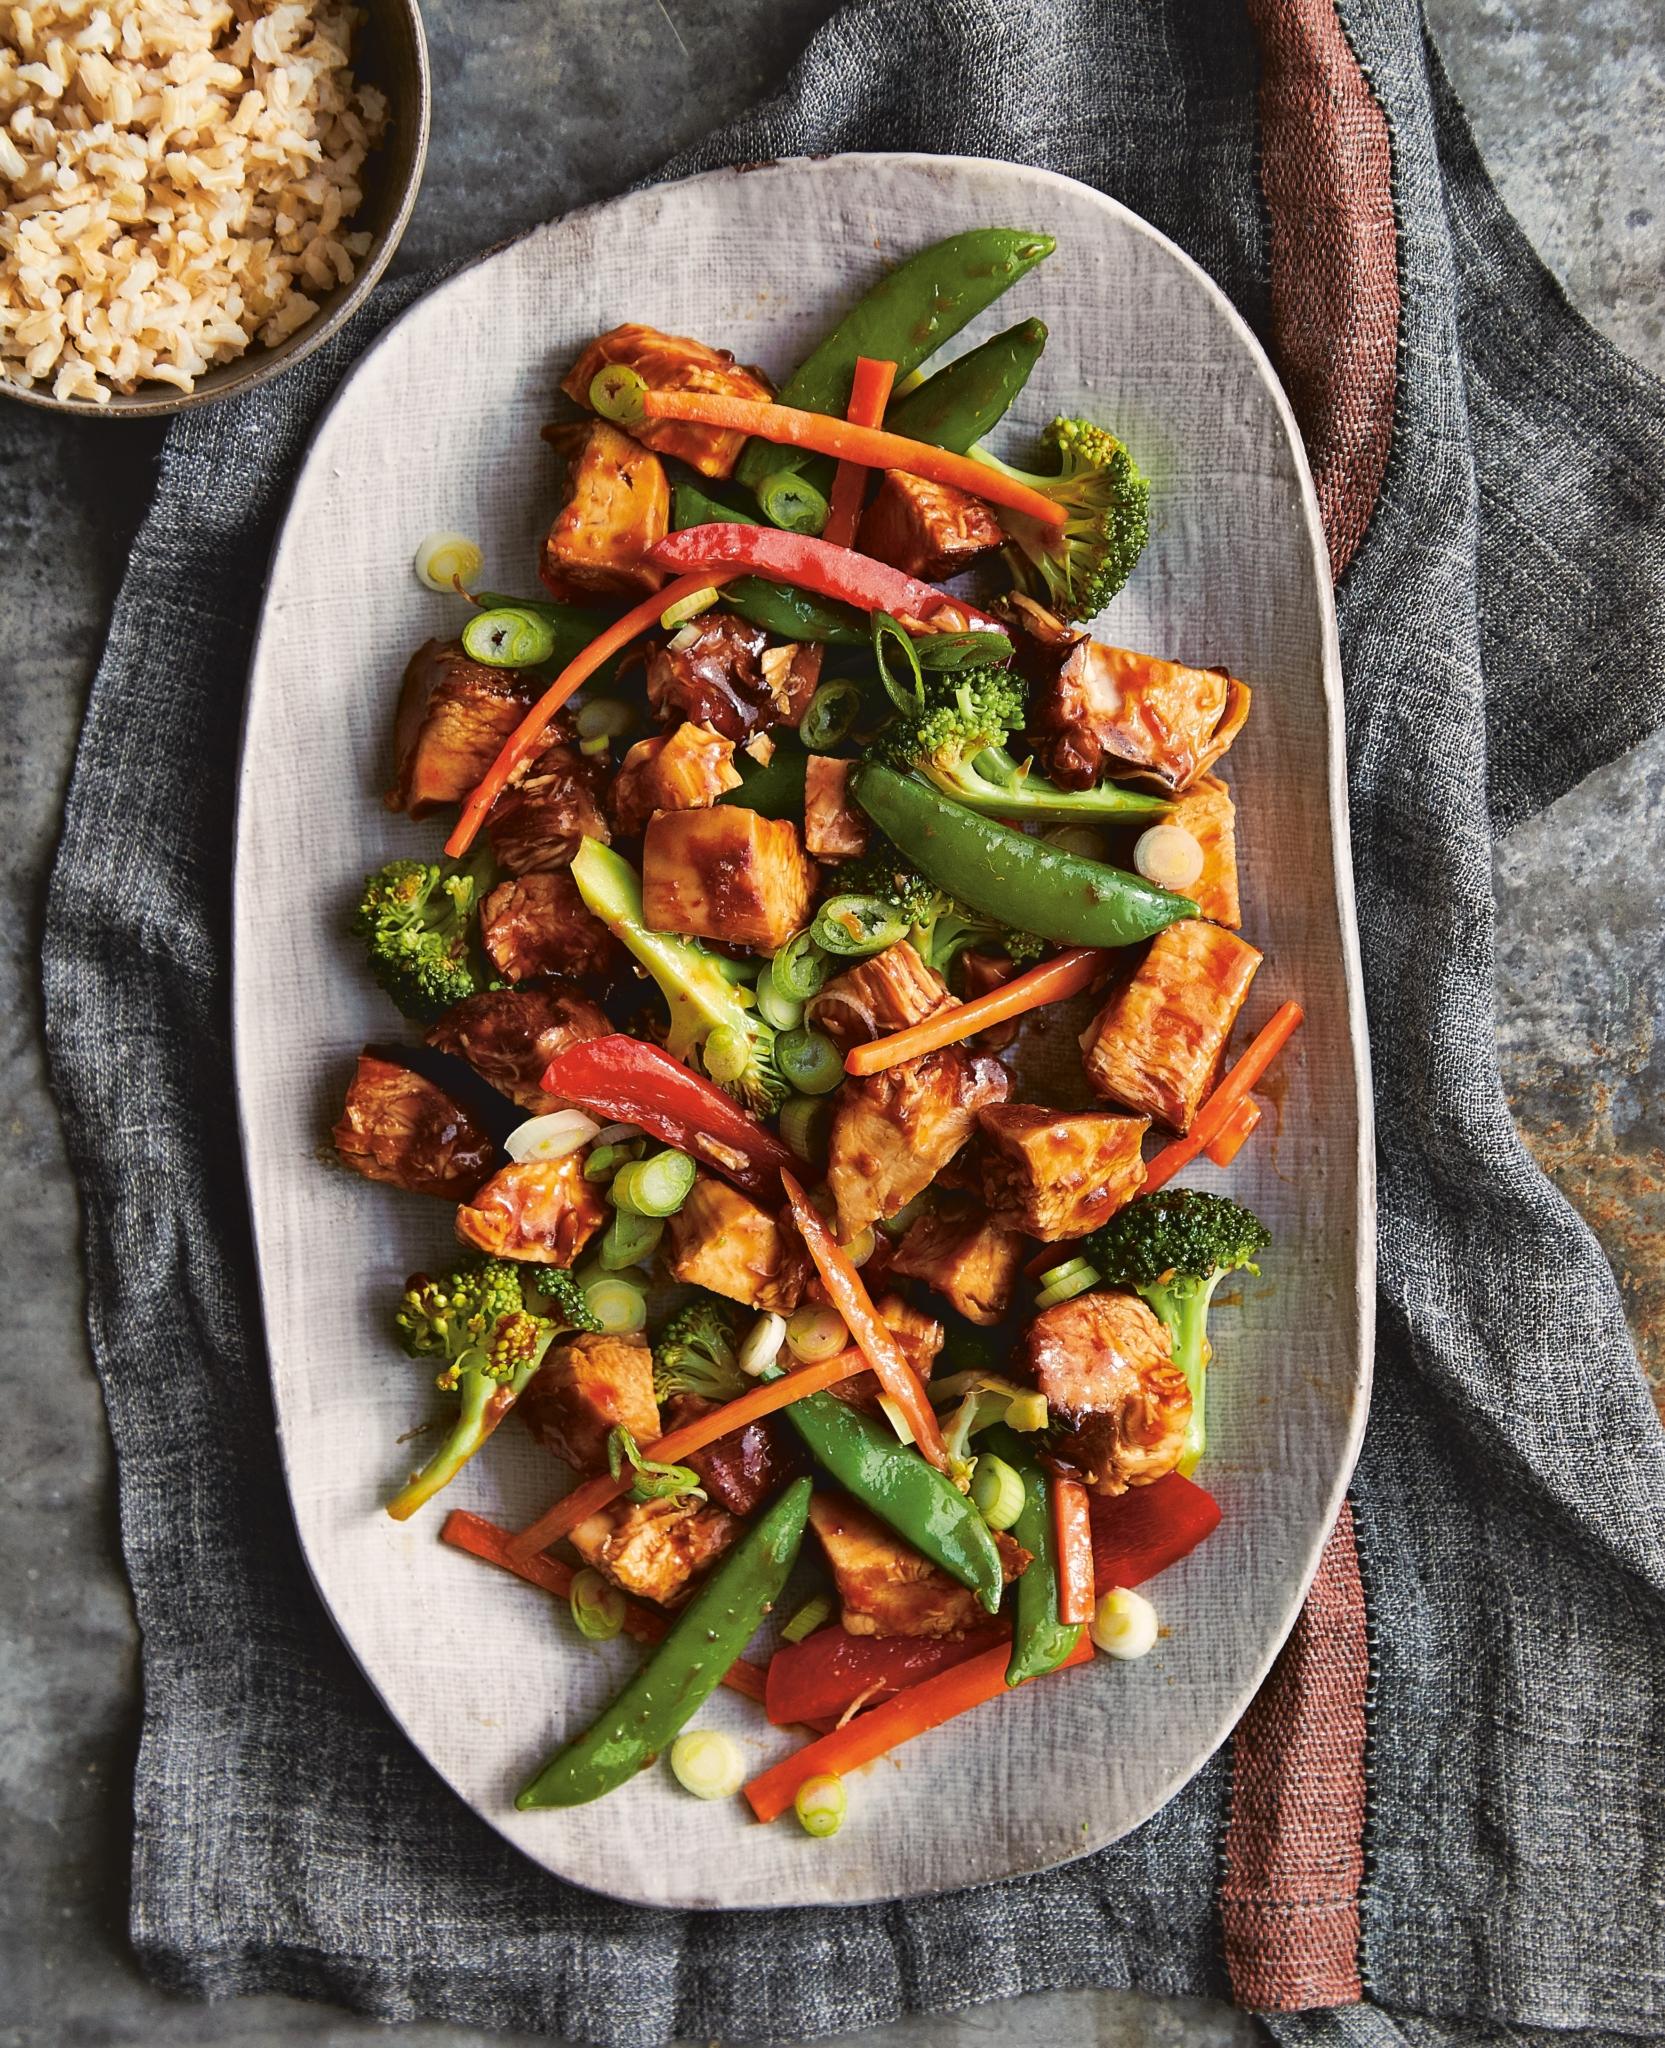 Honey Bourbon Chicken and Stir Fry Vegetables on a large white platter